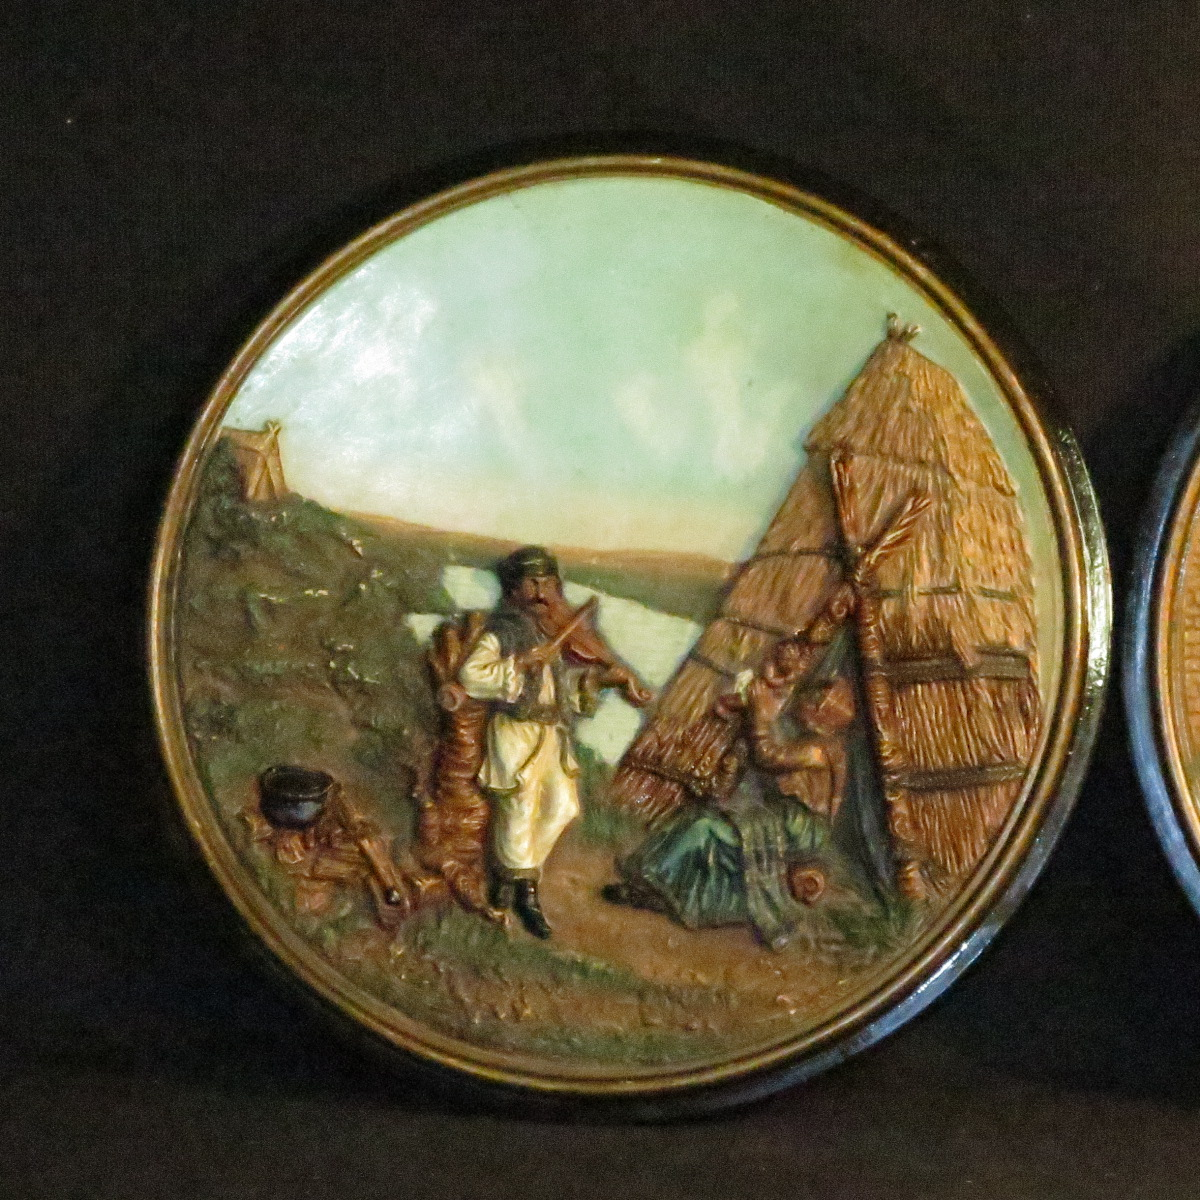 Johann Maresch Pair Of Plates Plates Pottery Central European Gypsies-photo-4